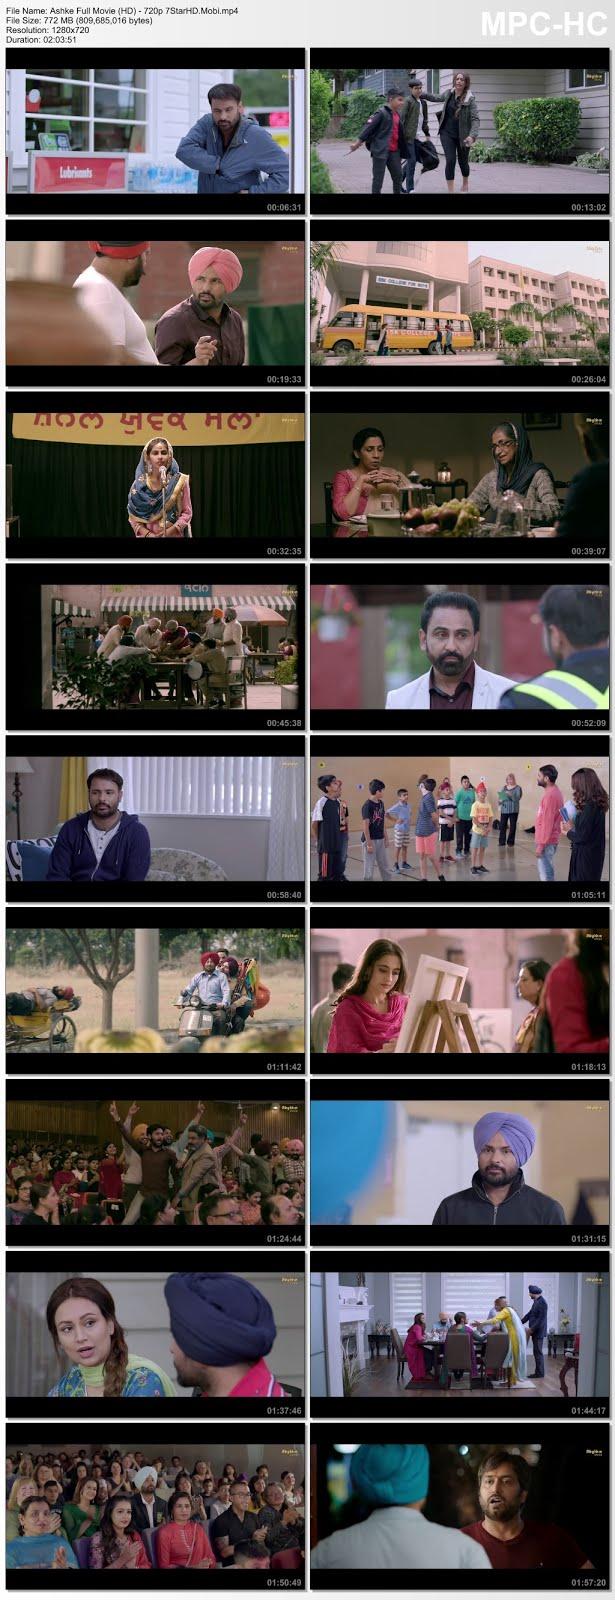 Watch Gelo 2015 Full Movie Online Free Download